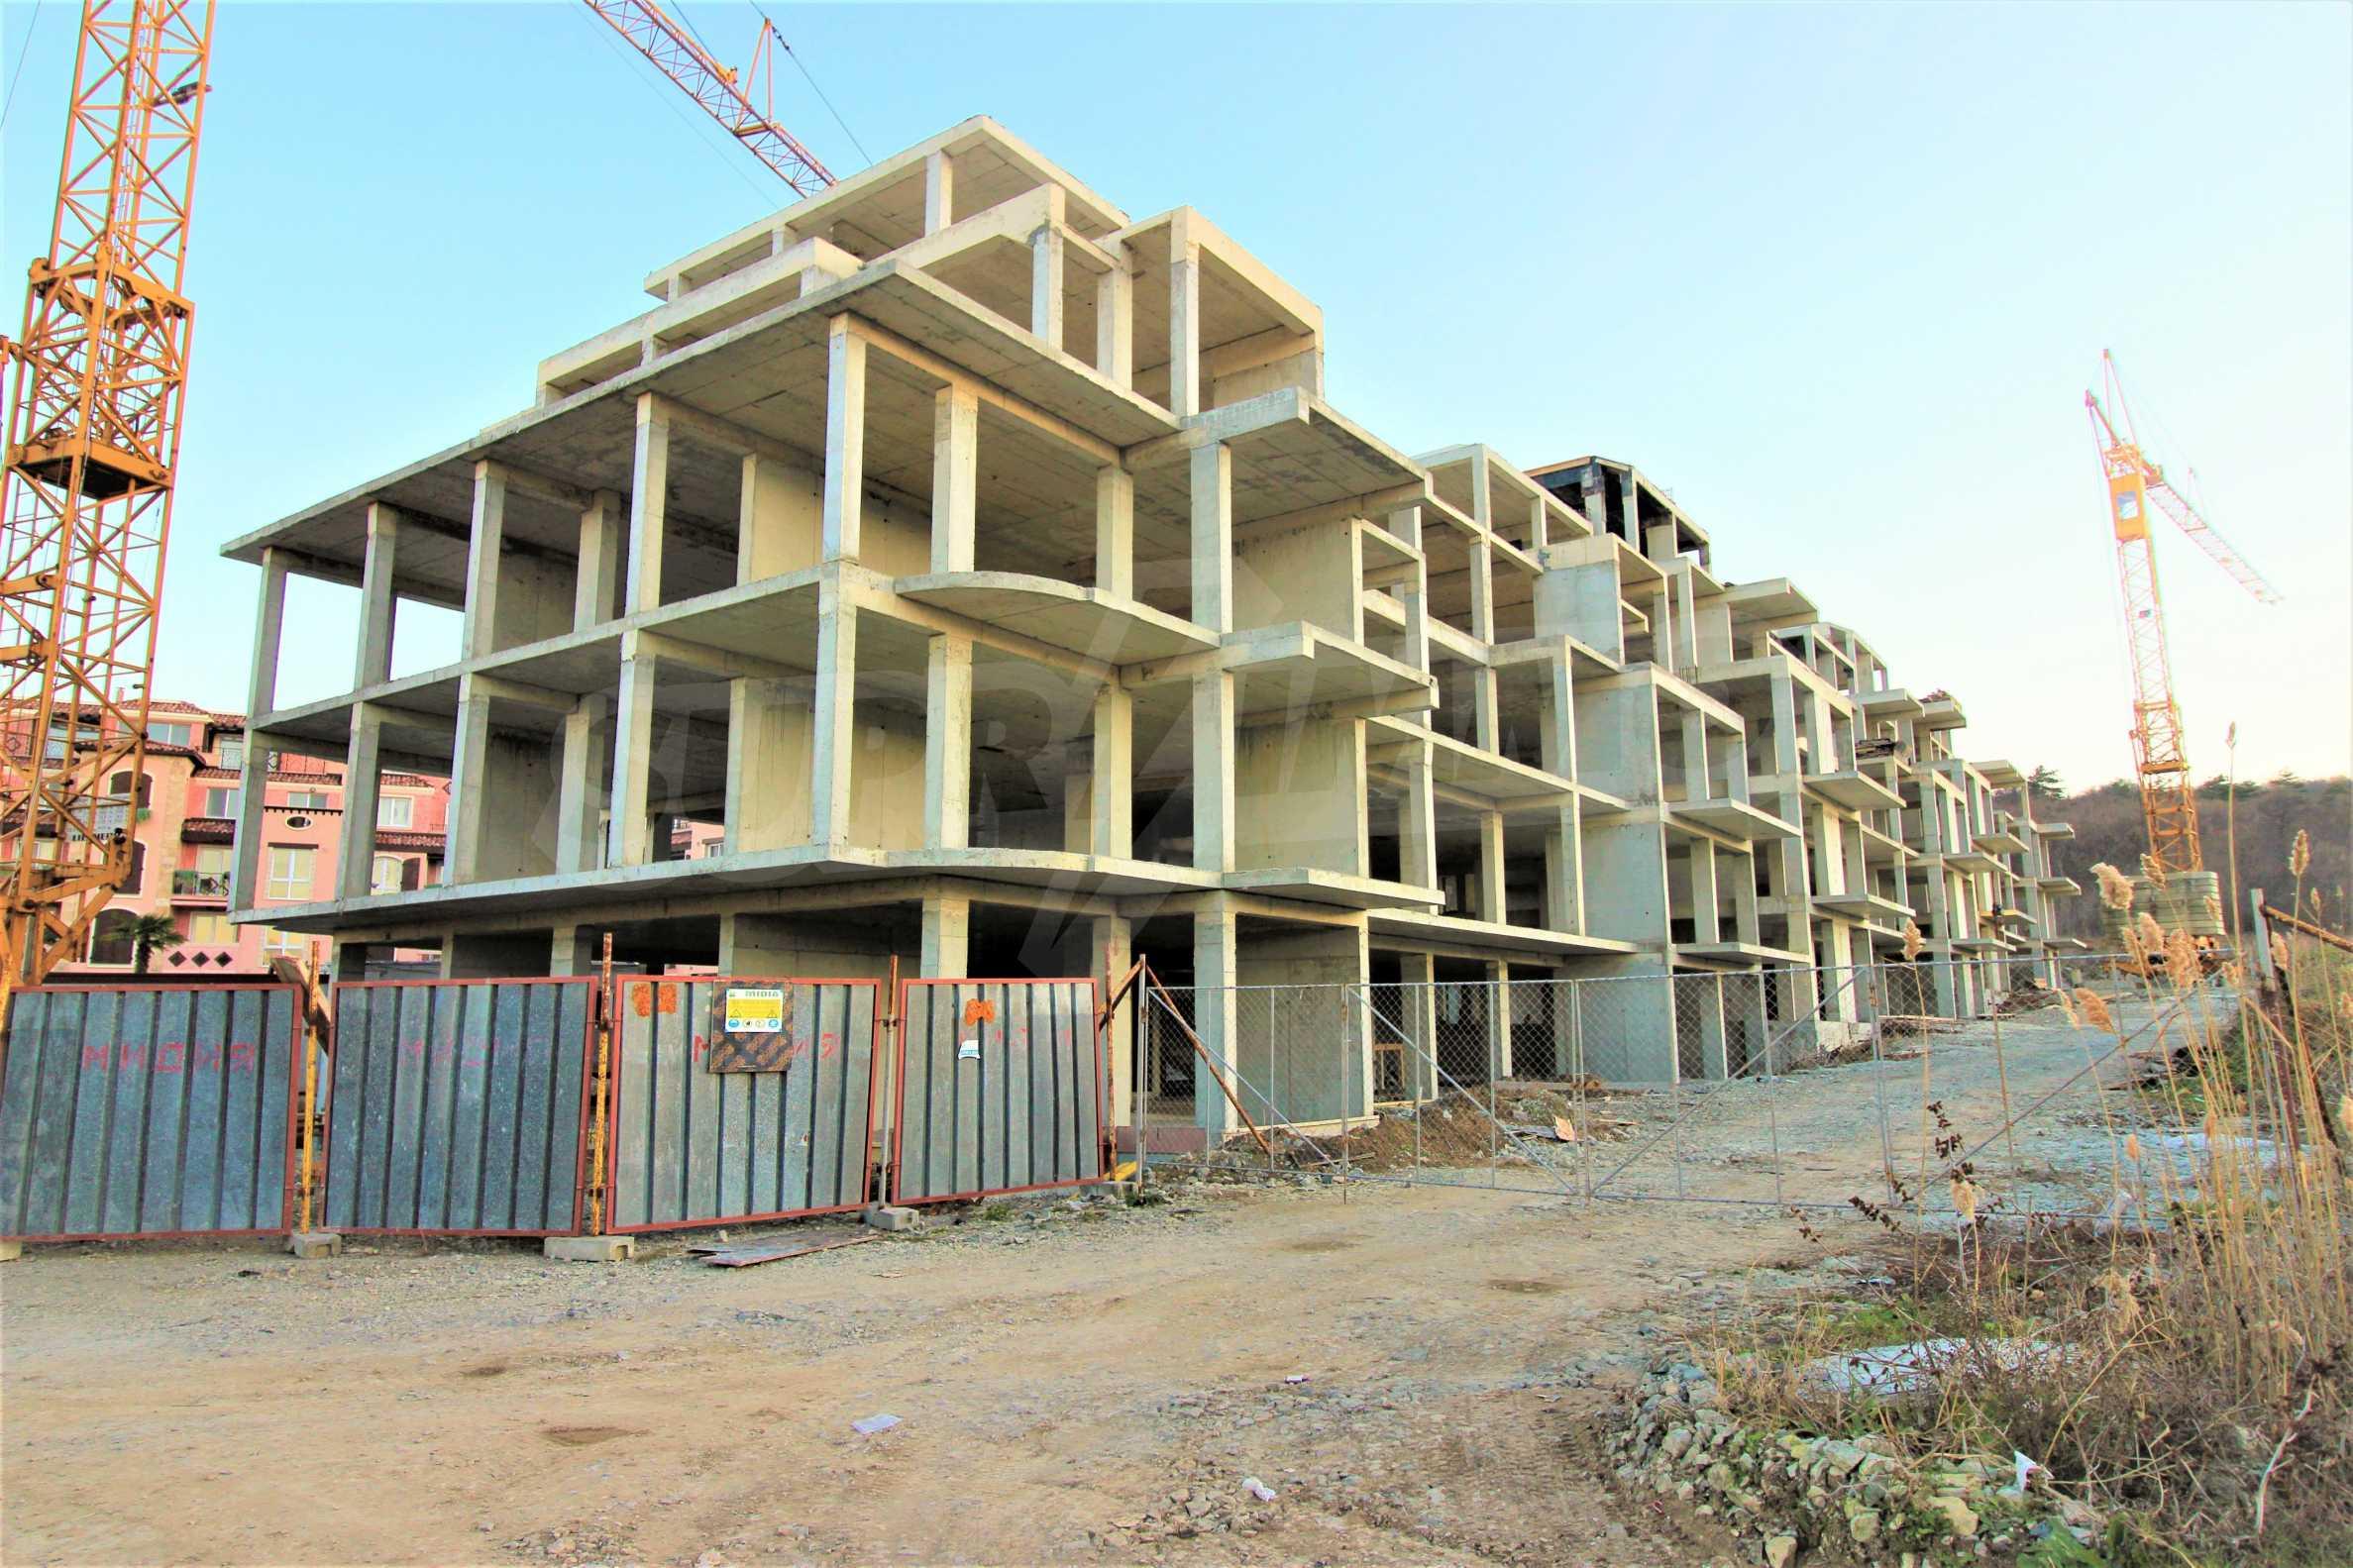 New 1-bedroom apartment in a coastal complex by the Kavatsite Beach (Sozopol) 20